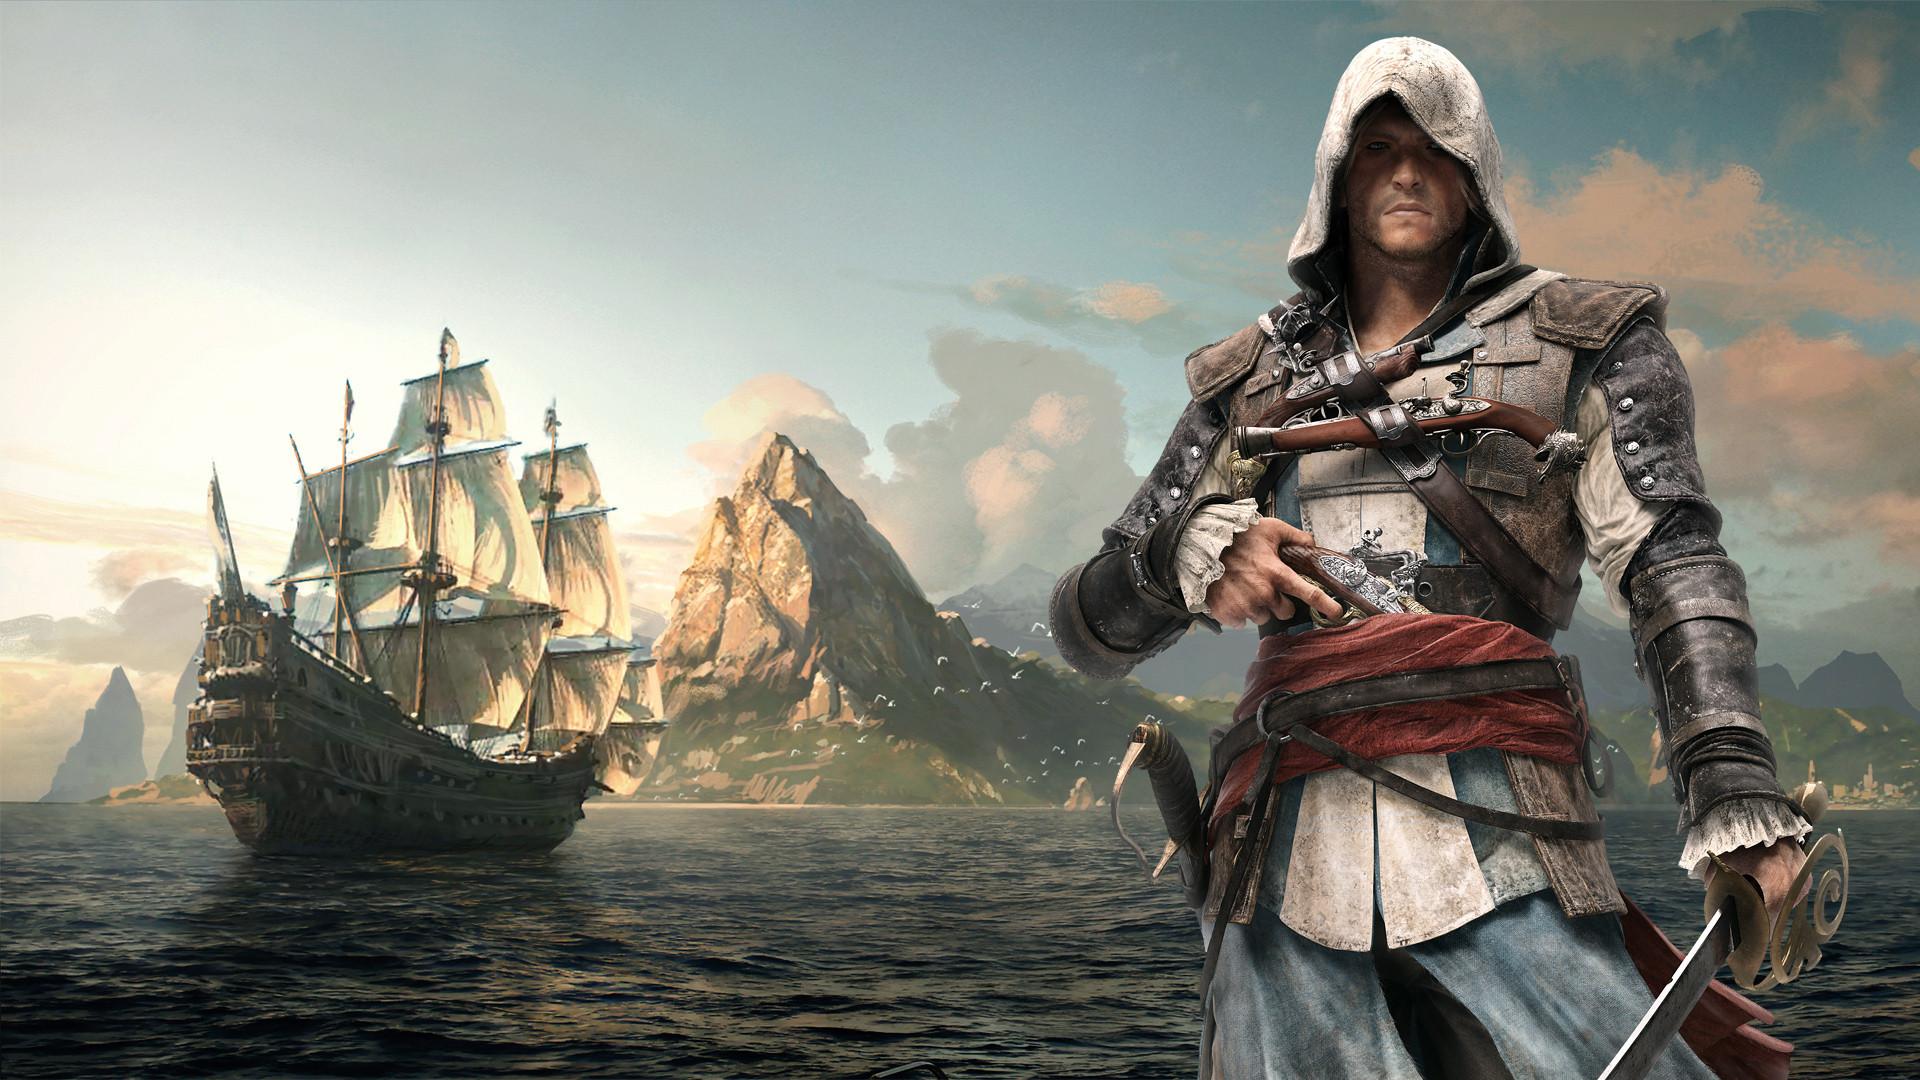 1920x1080 Assassins Creed Iv Black Flag Assassins Creed Iv Showdown Im Dschungel Screenshot